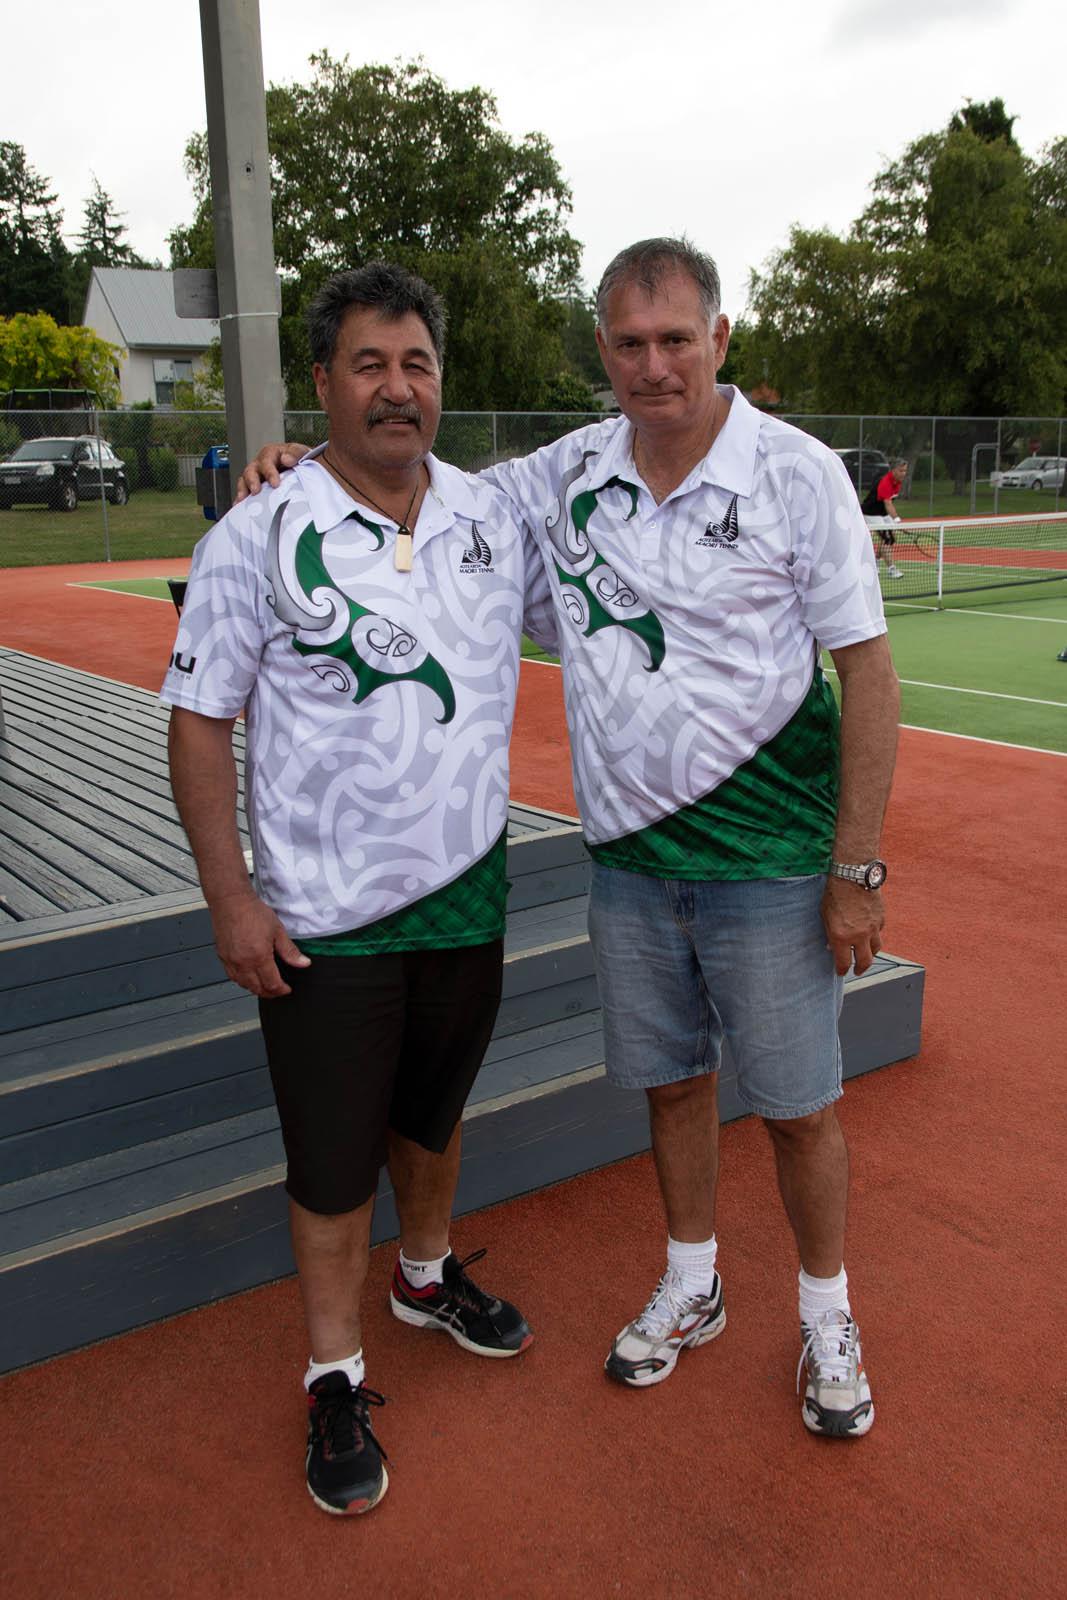 Integration QA 60-69 Mens Doubles Joint Winners Greg Johnson and Martin Wepa